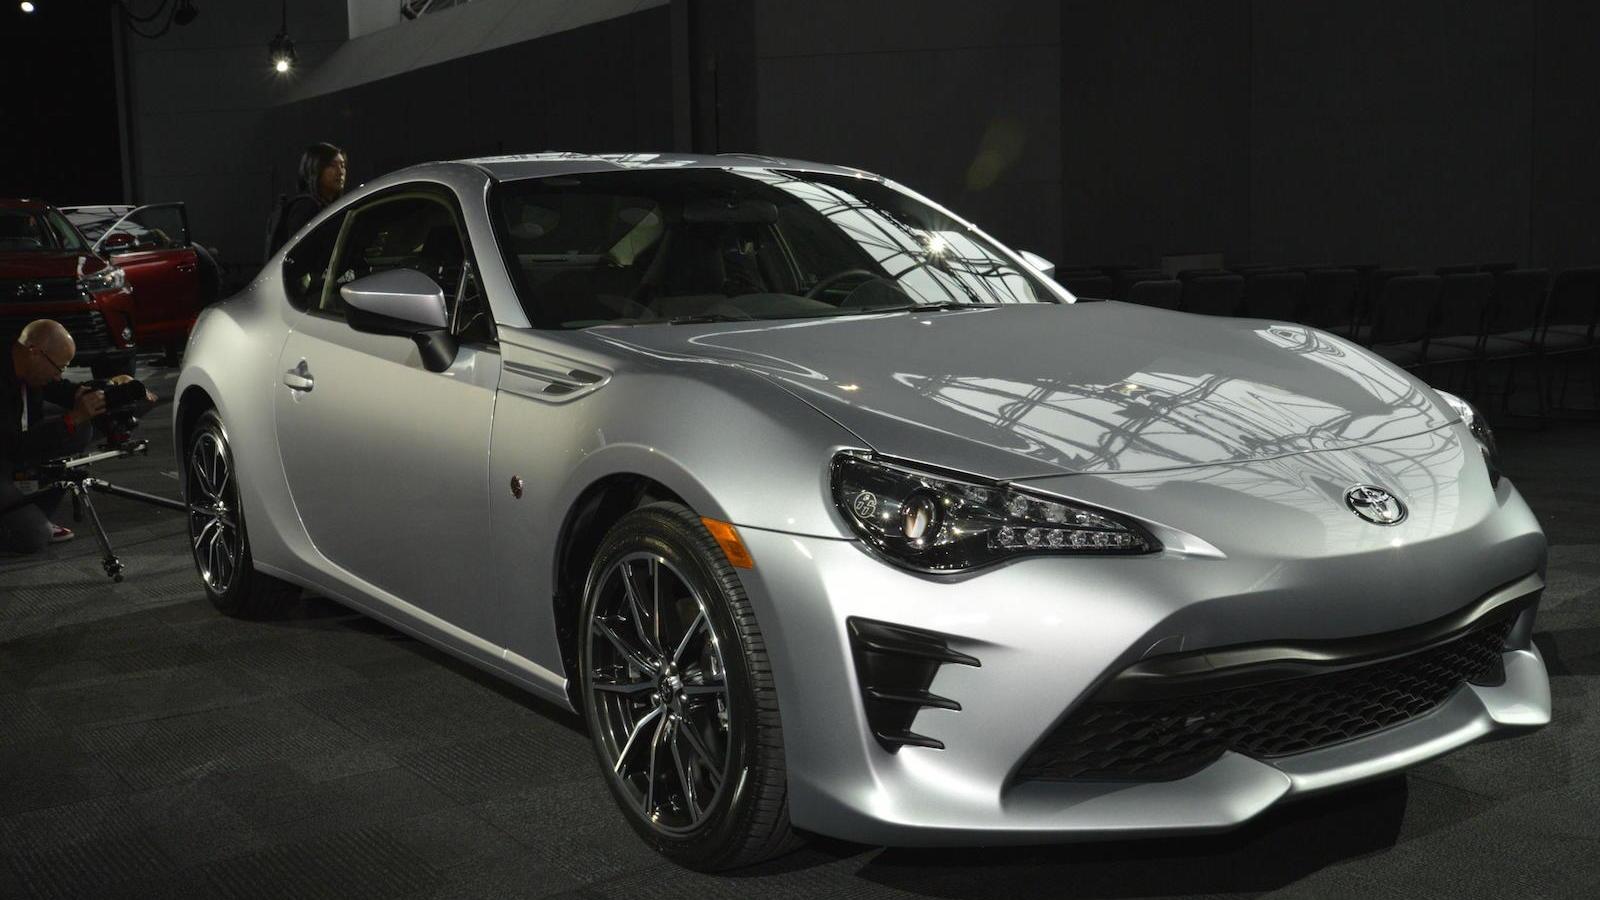 2017 Toyota 86, 2016 New York Auto Show